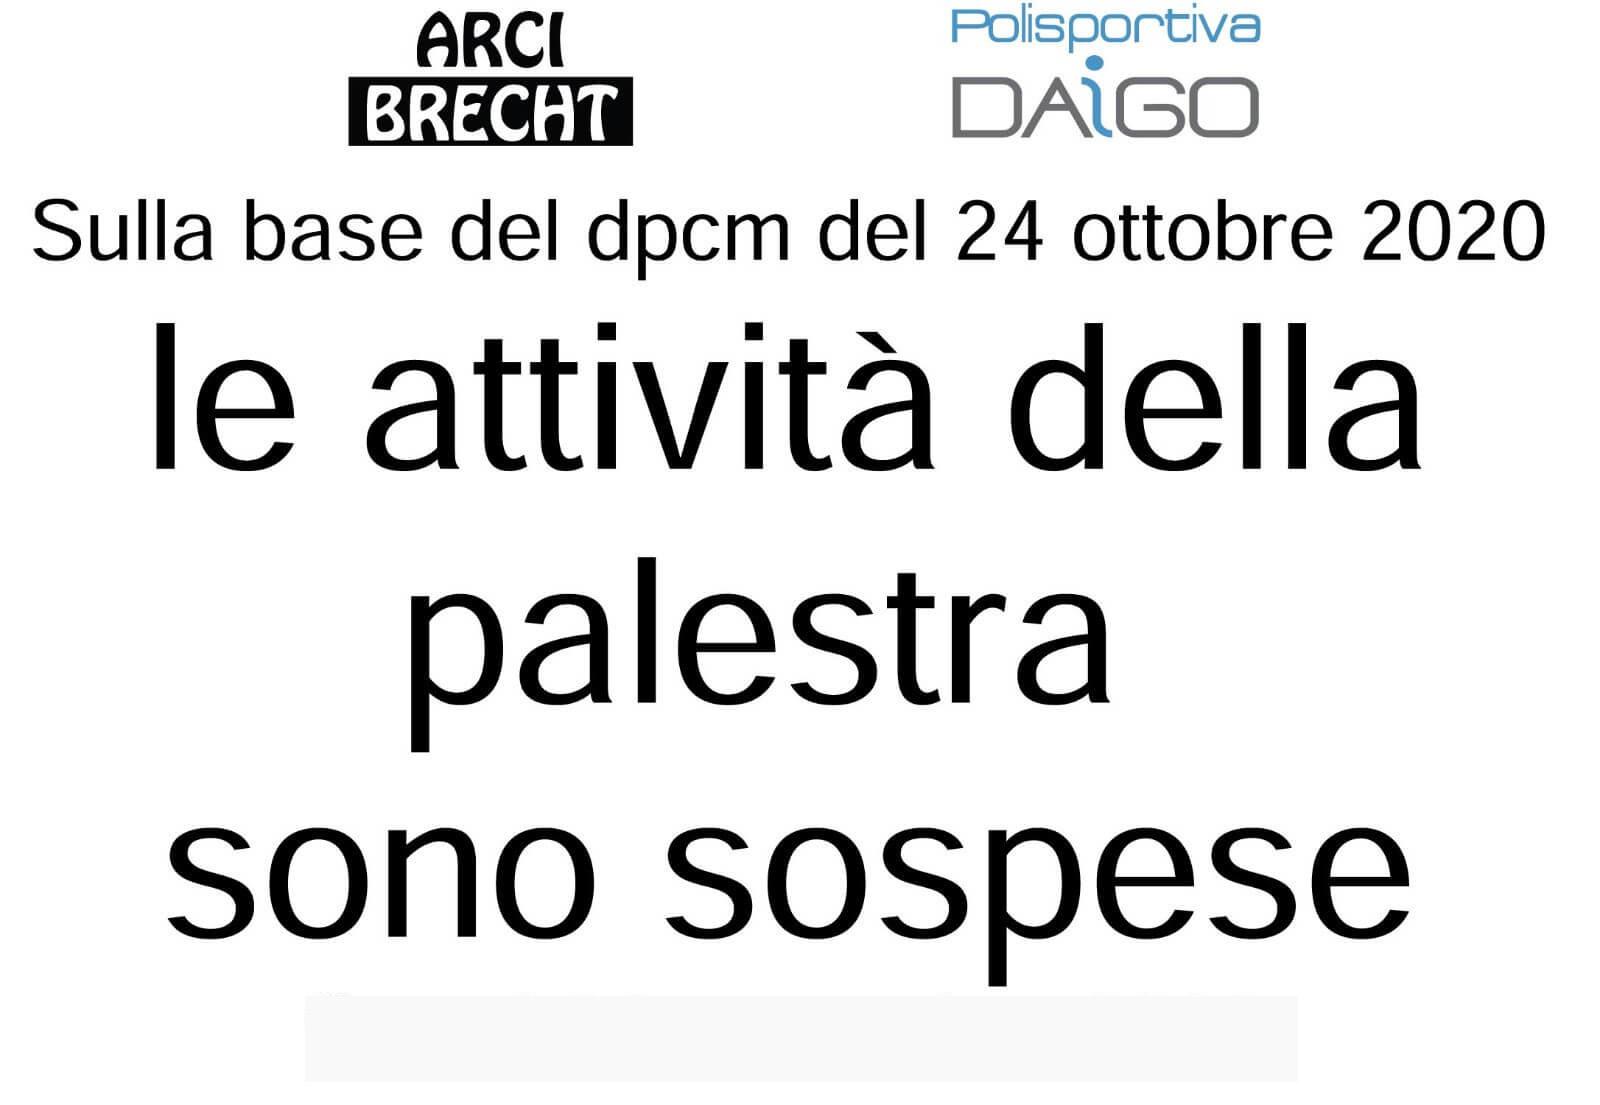 Palestra Polisportiva Daigo